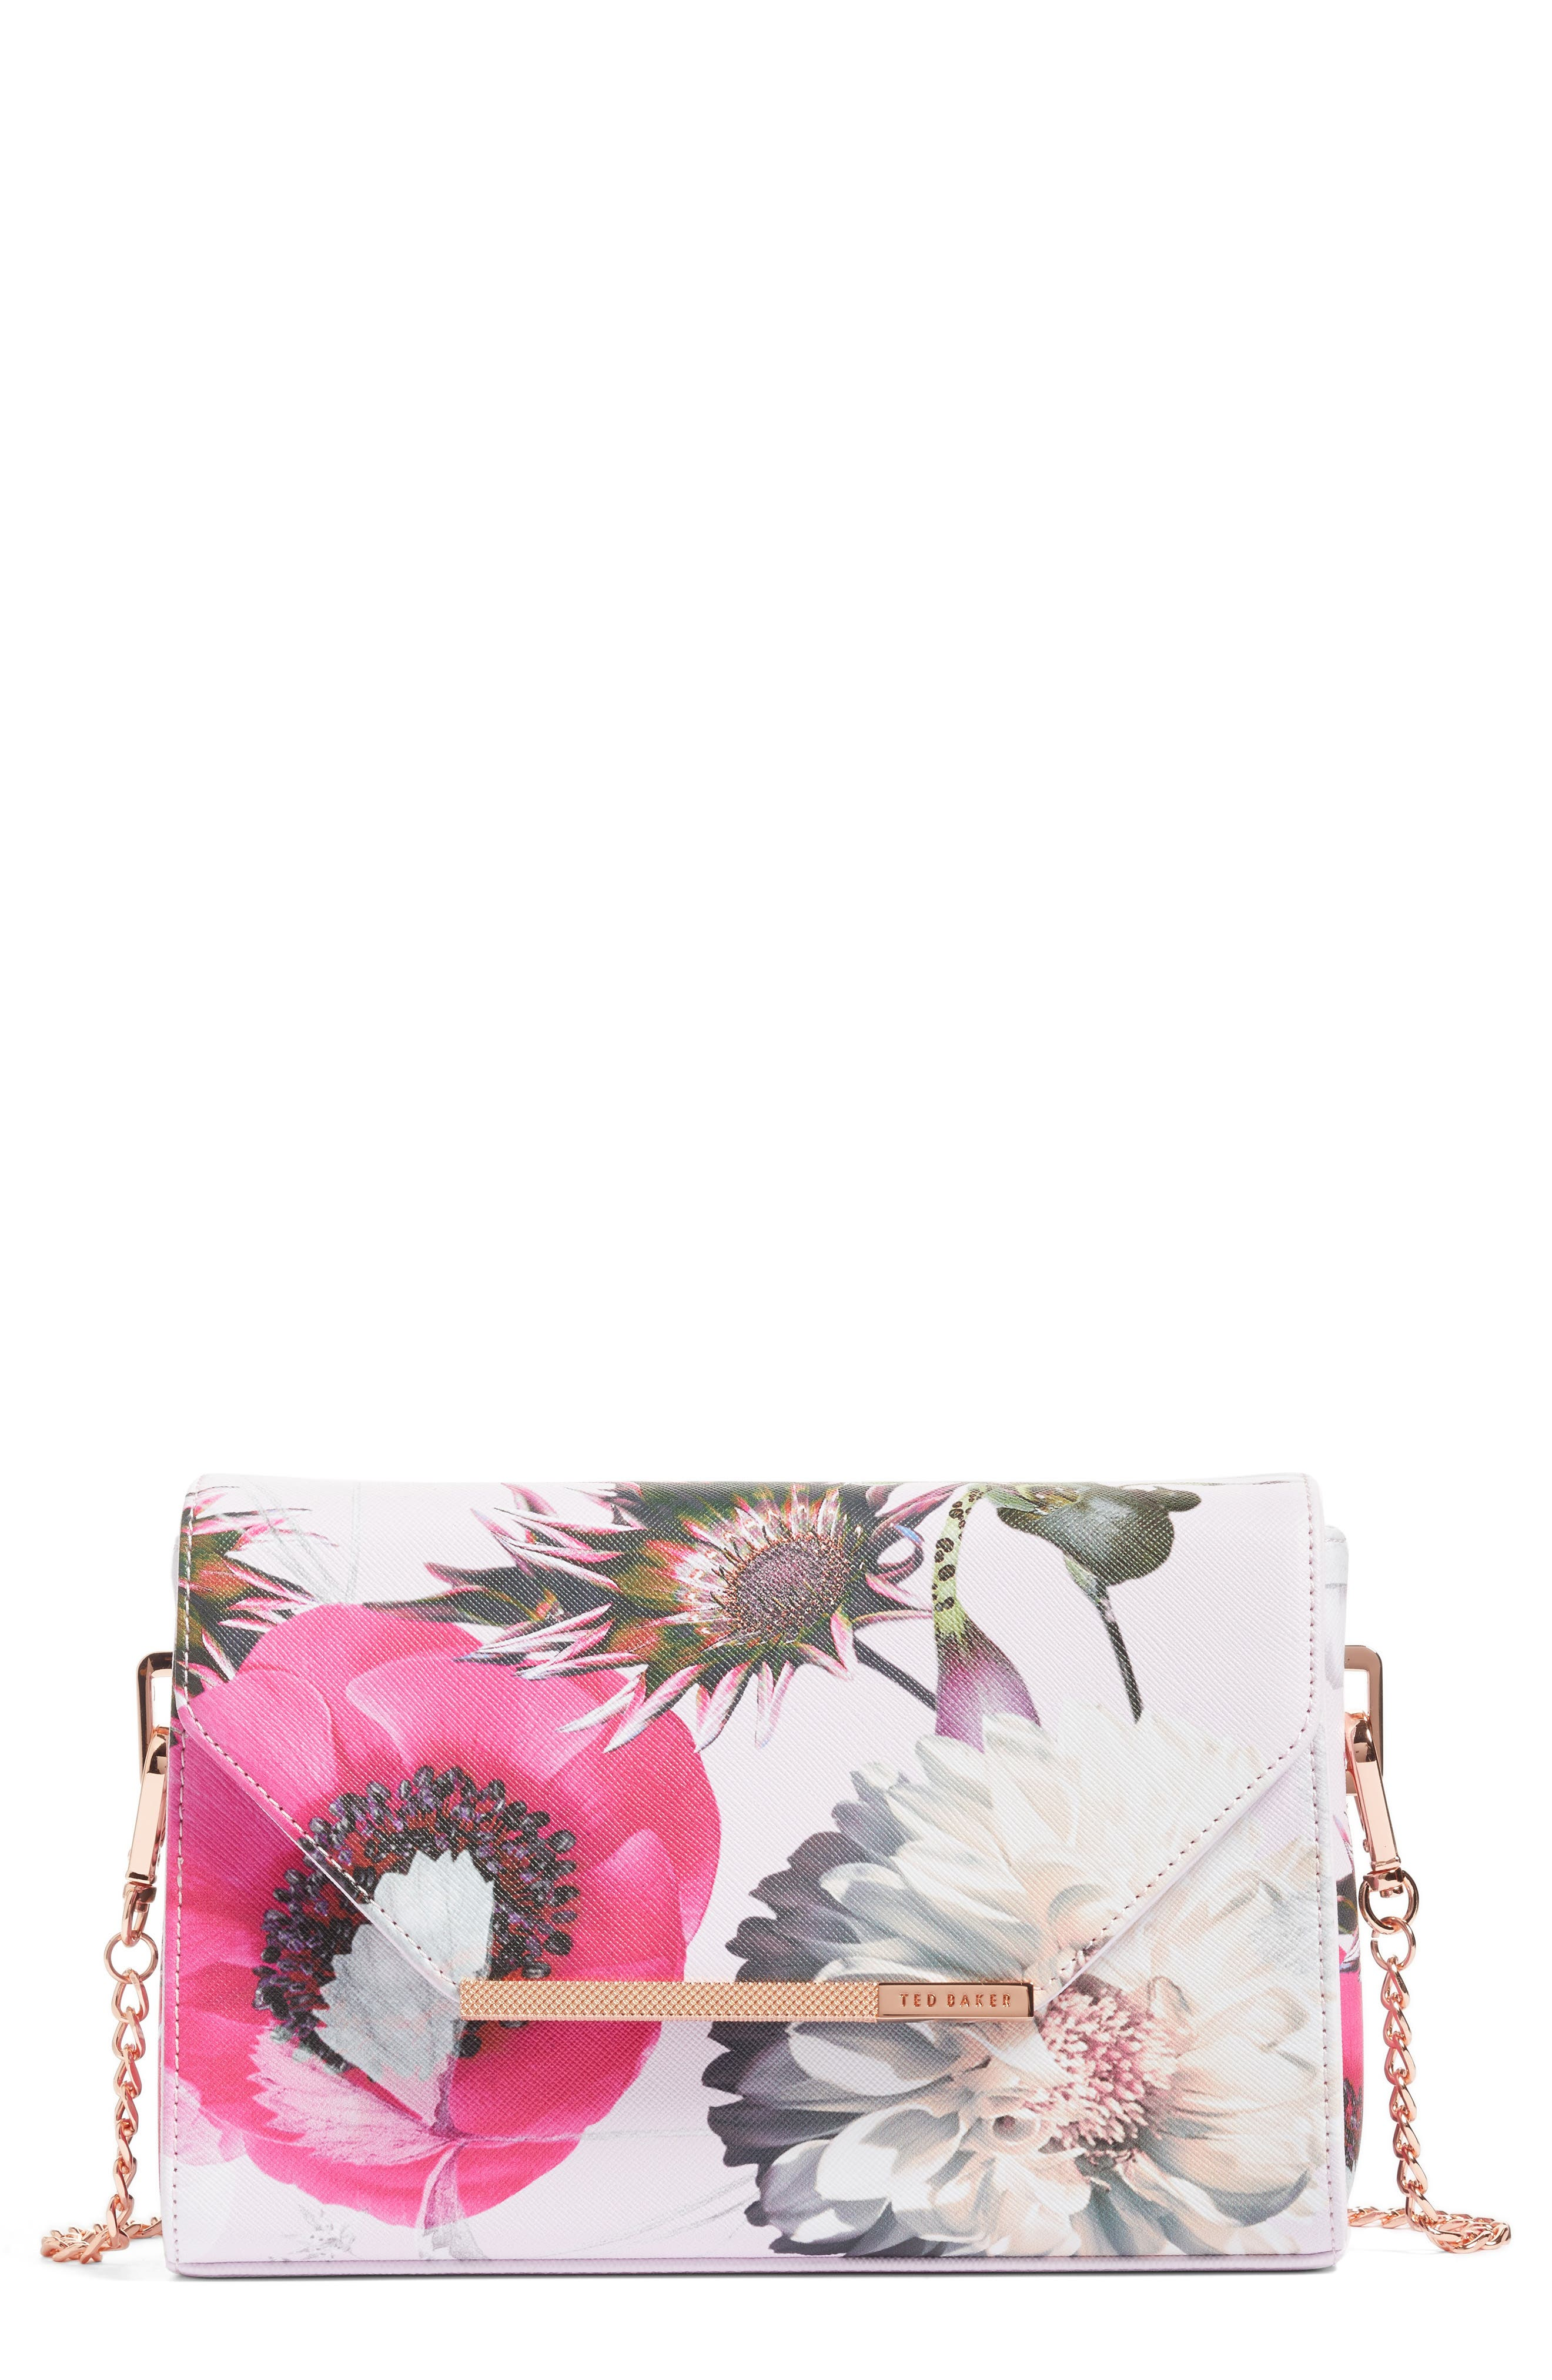 Ted Baker London Panello Neon Poppy Textured Bar Crossbody Bag (Nordstrom Exclusive)